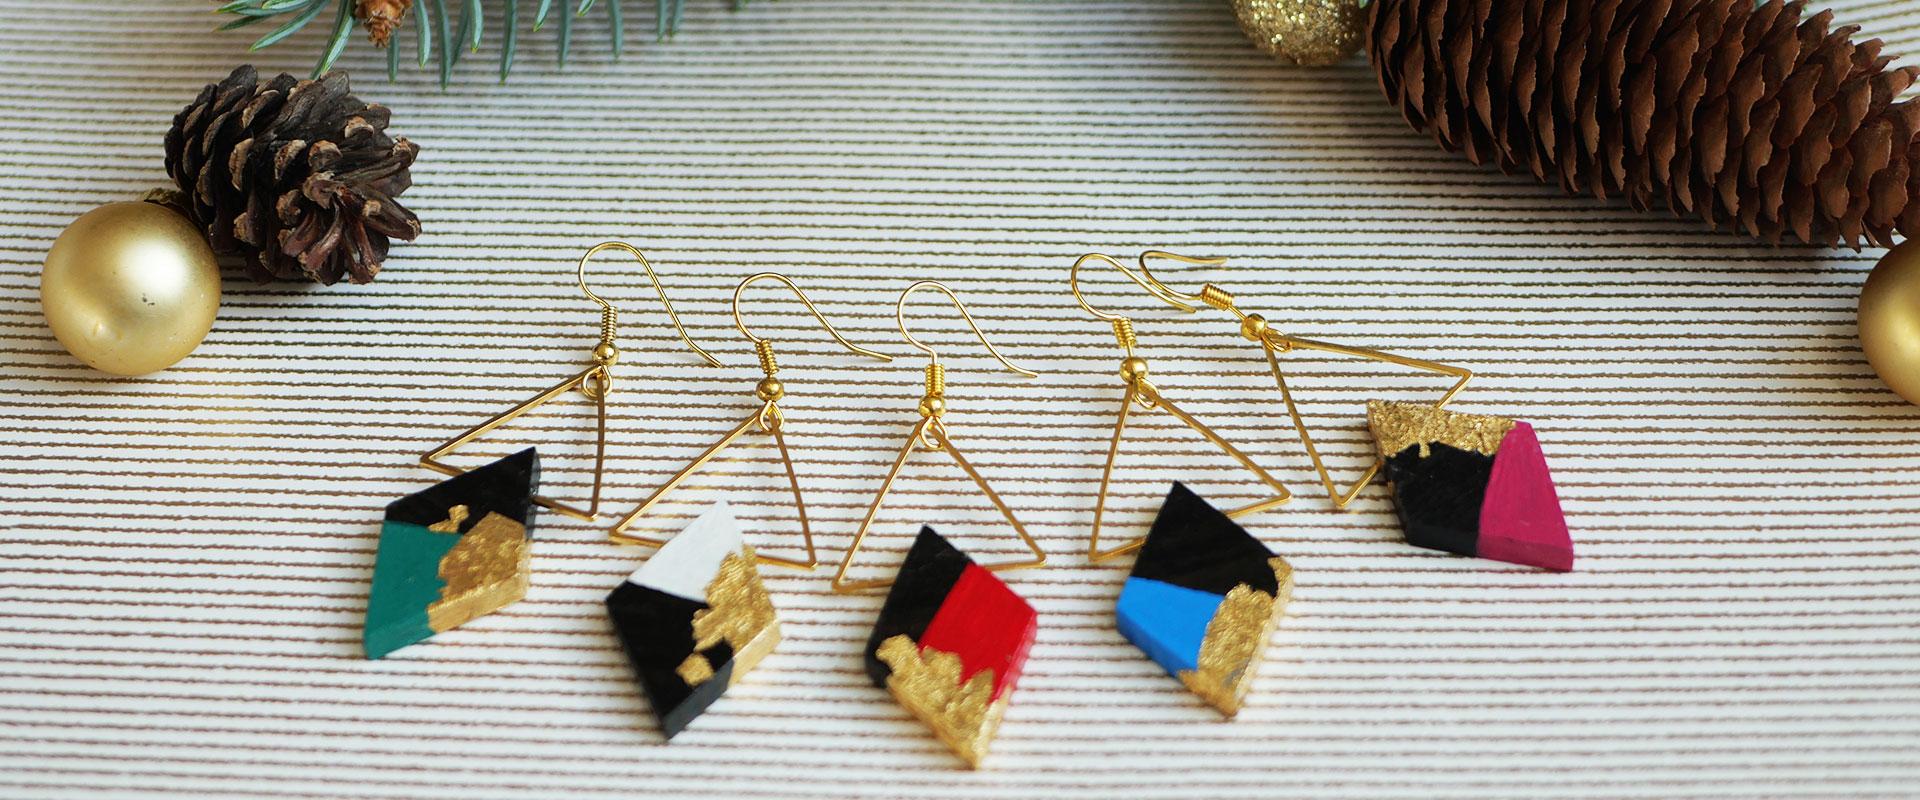 Gebetnout bijoux fantaisie lyon mode tendance bijouterie femme Annecy artisan bois ebene peinture geometrie triangle losange dore